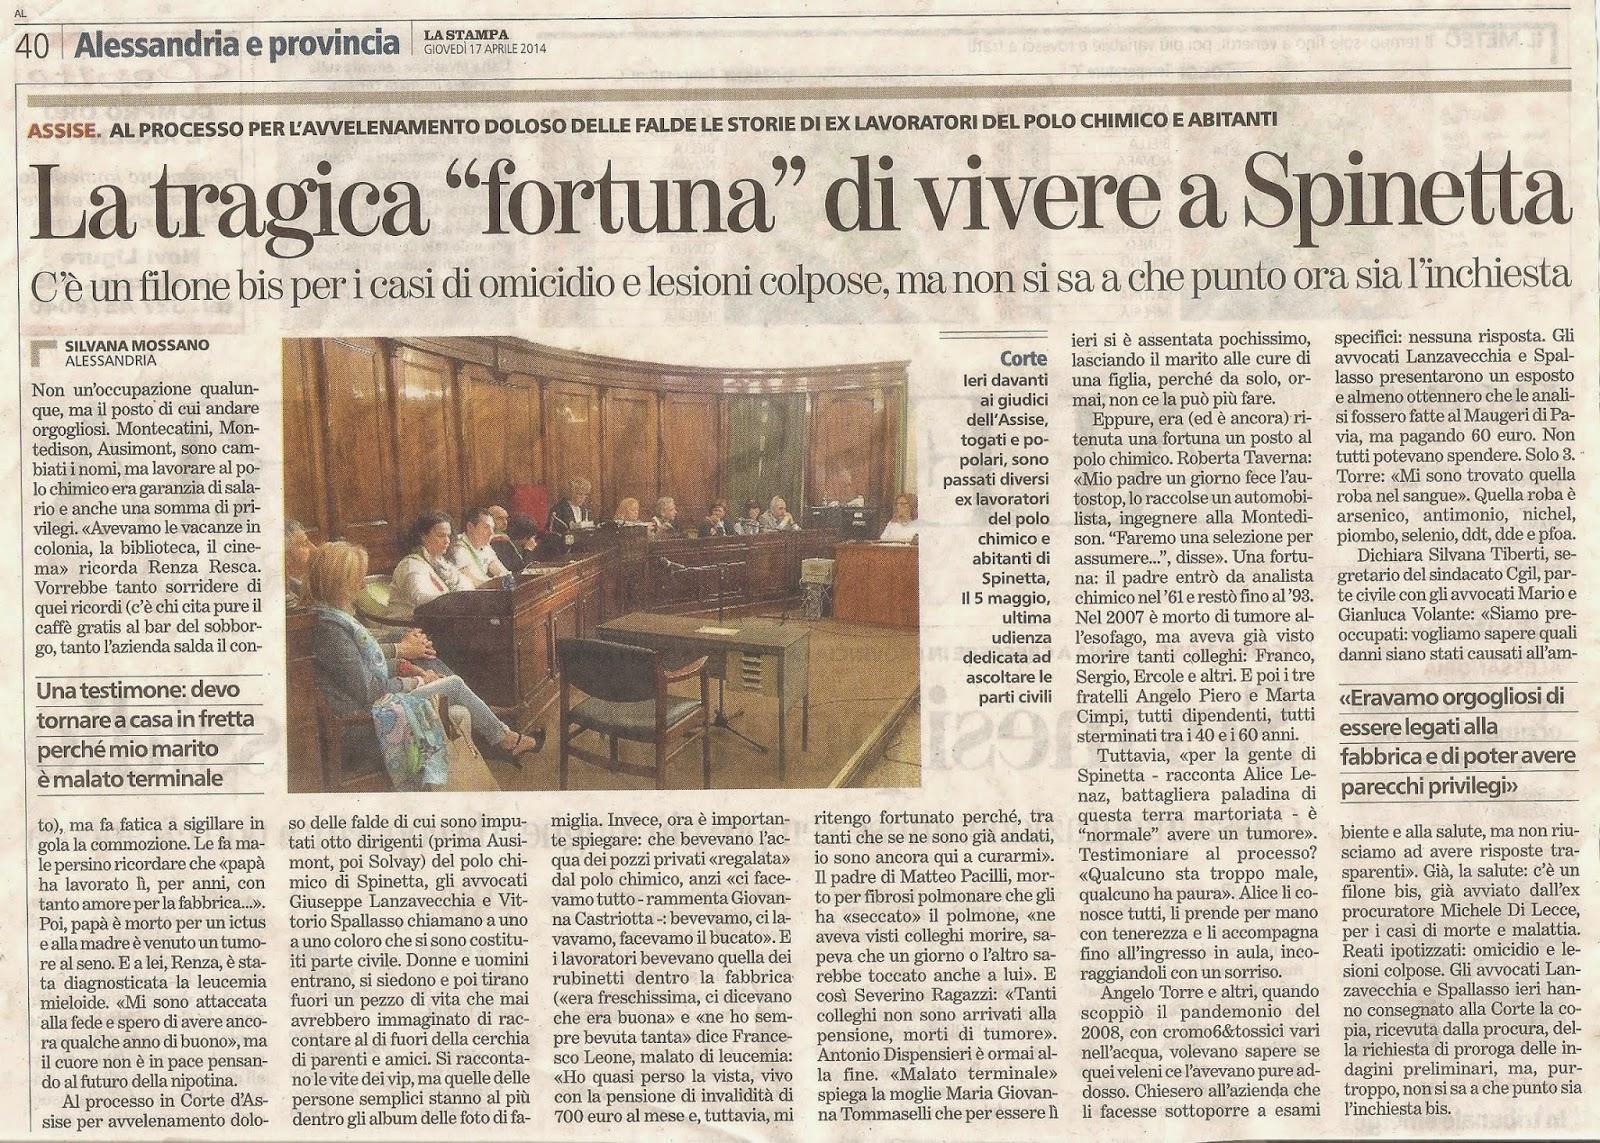 http://www.scribd.com/doc/218818656/Udienza-16-Apr-14-La-Stampa